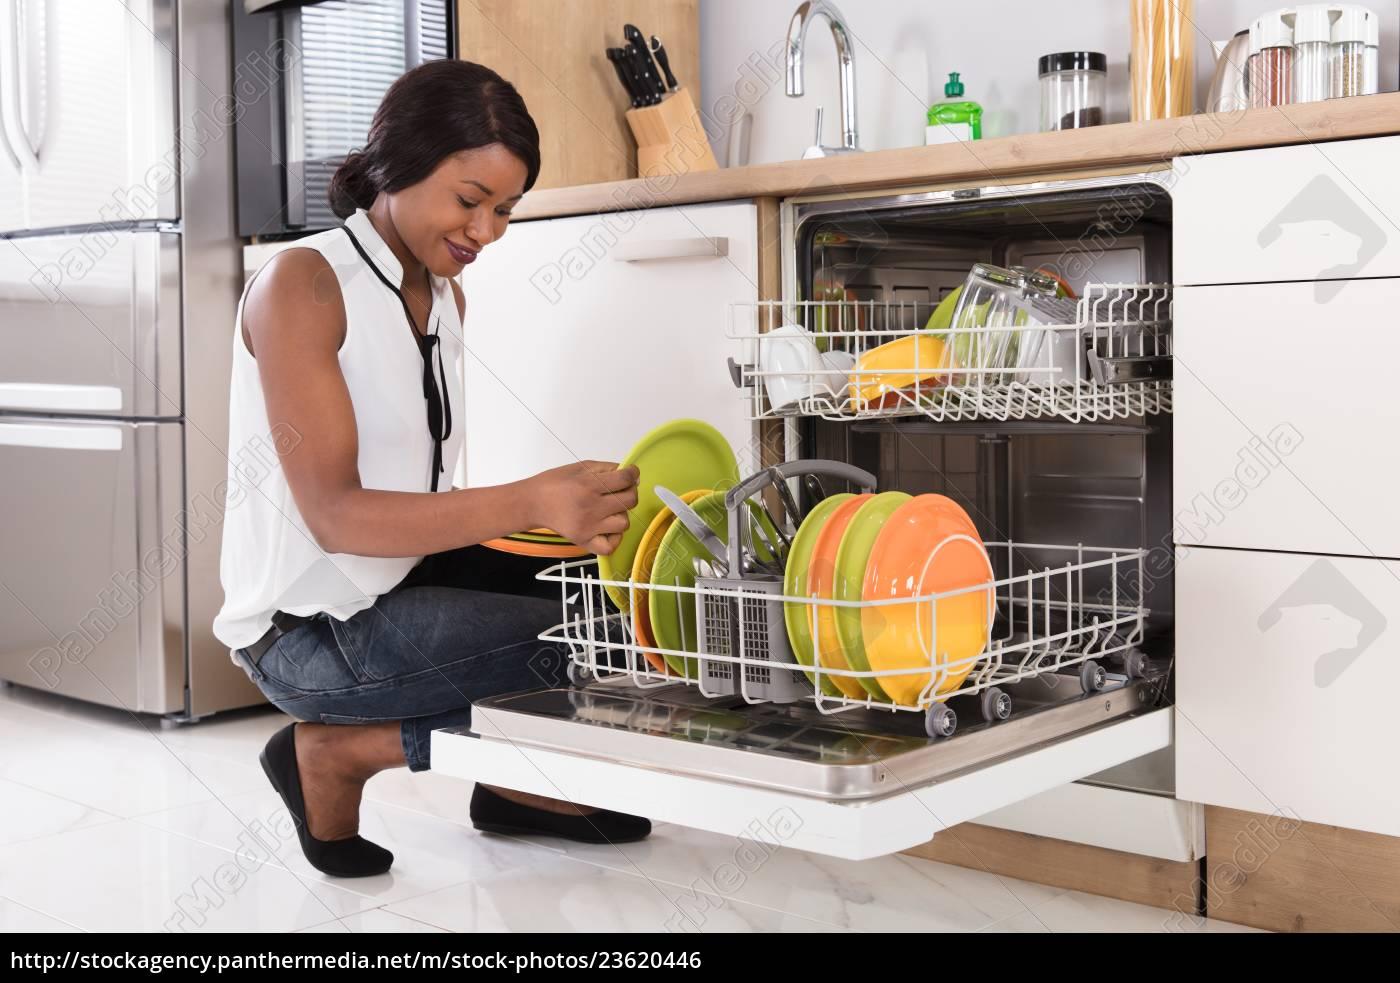 woman, arranging, plates, in, dishwasher - 23620446